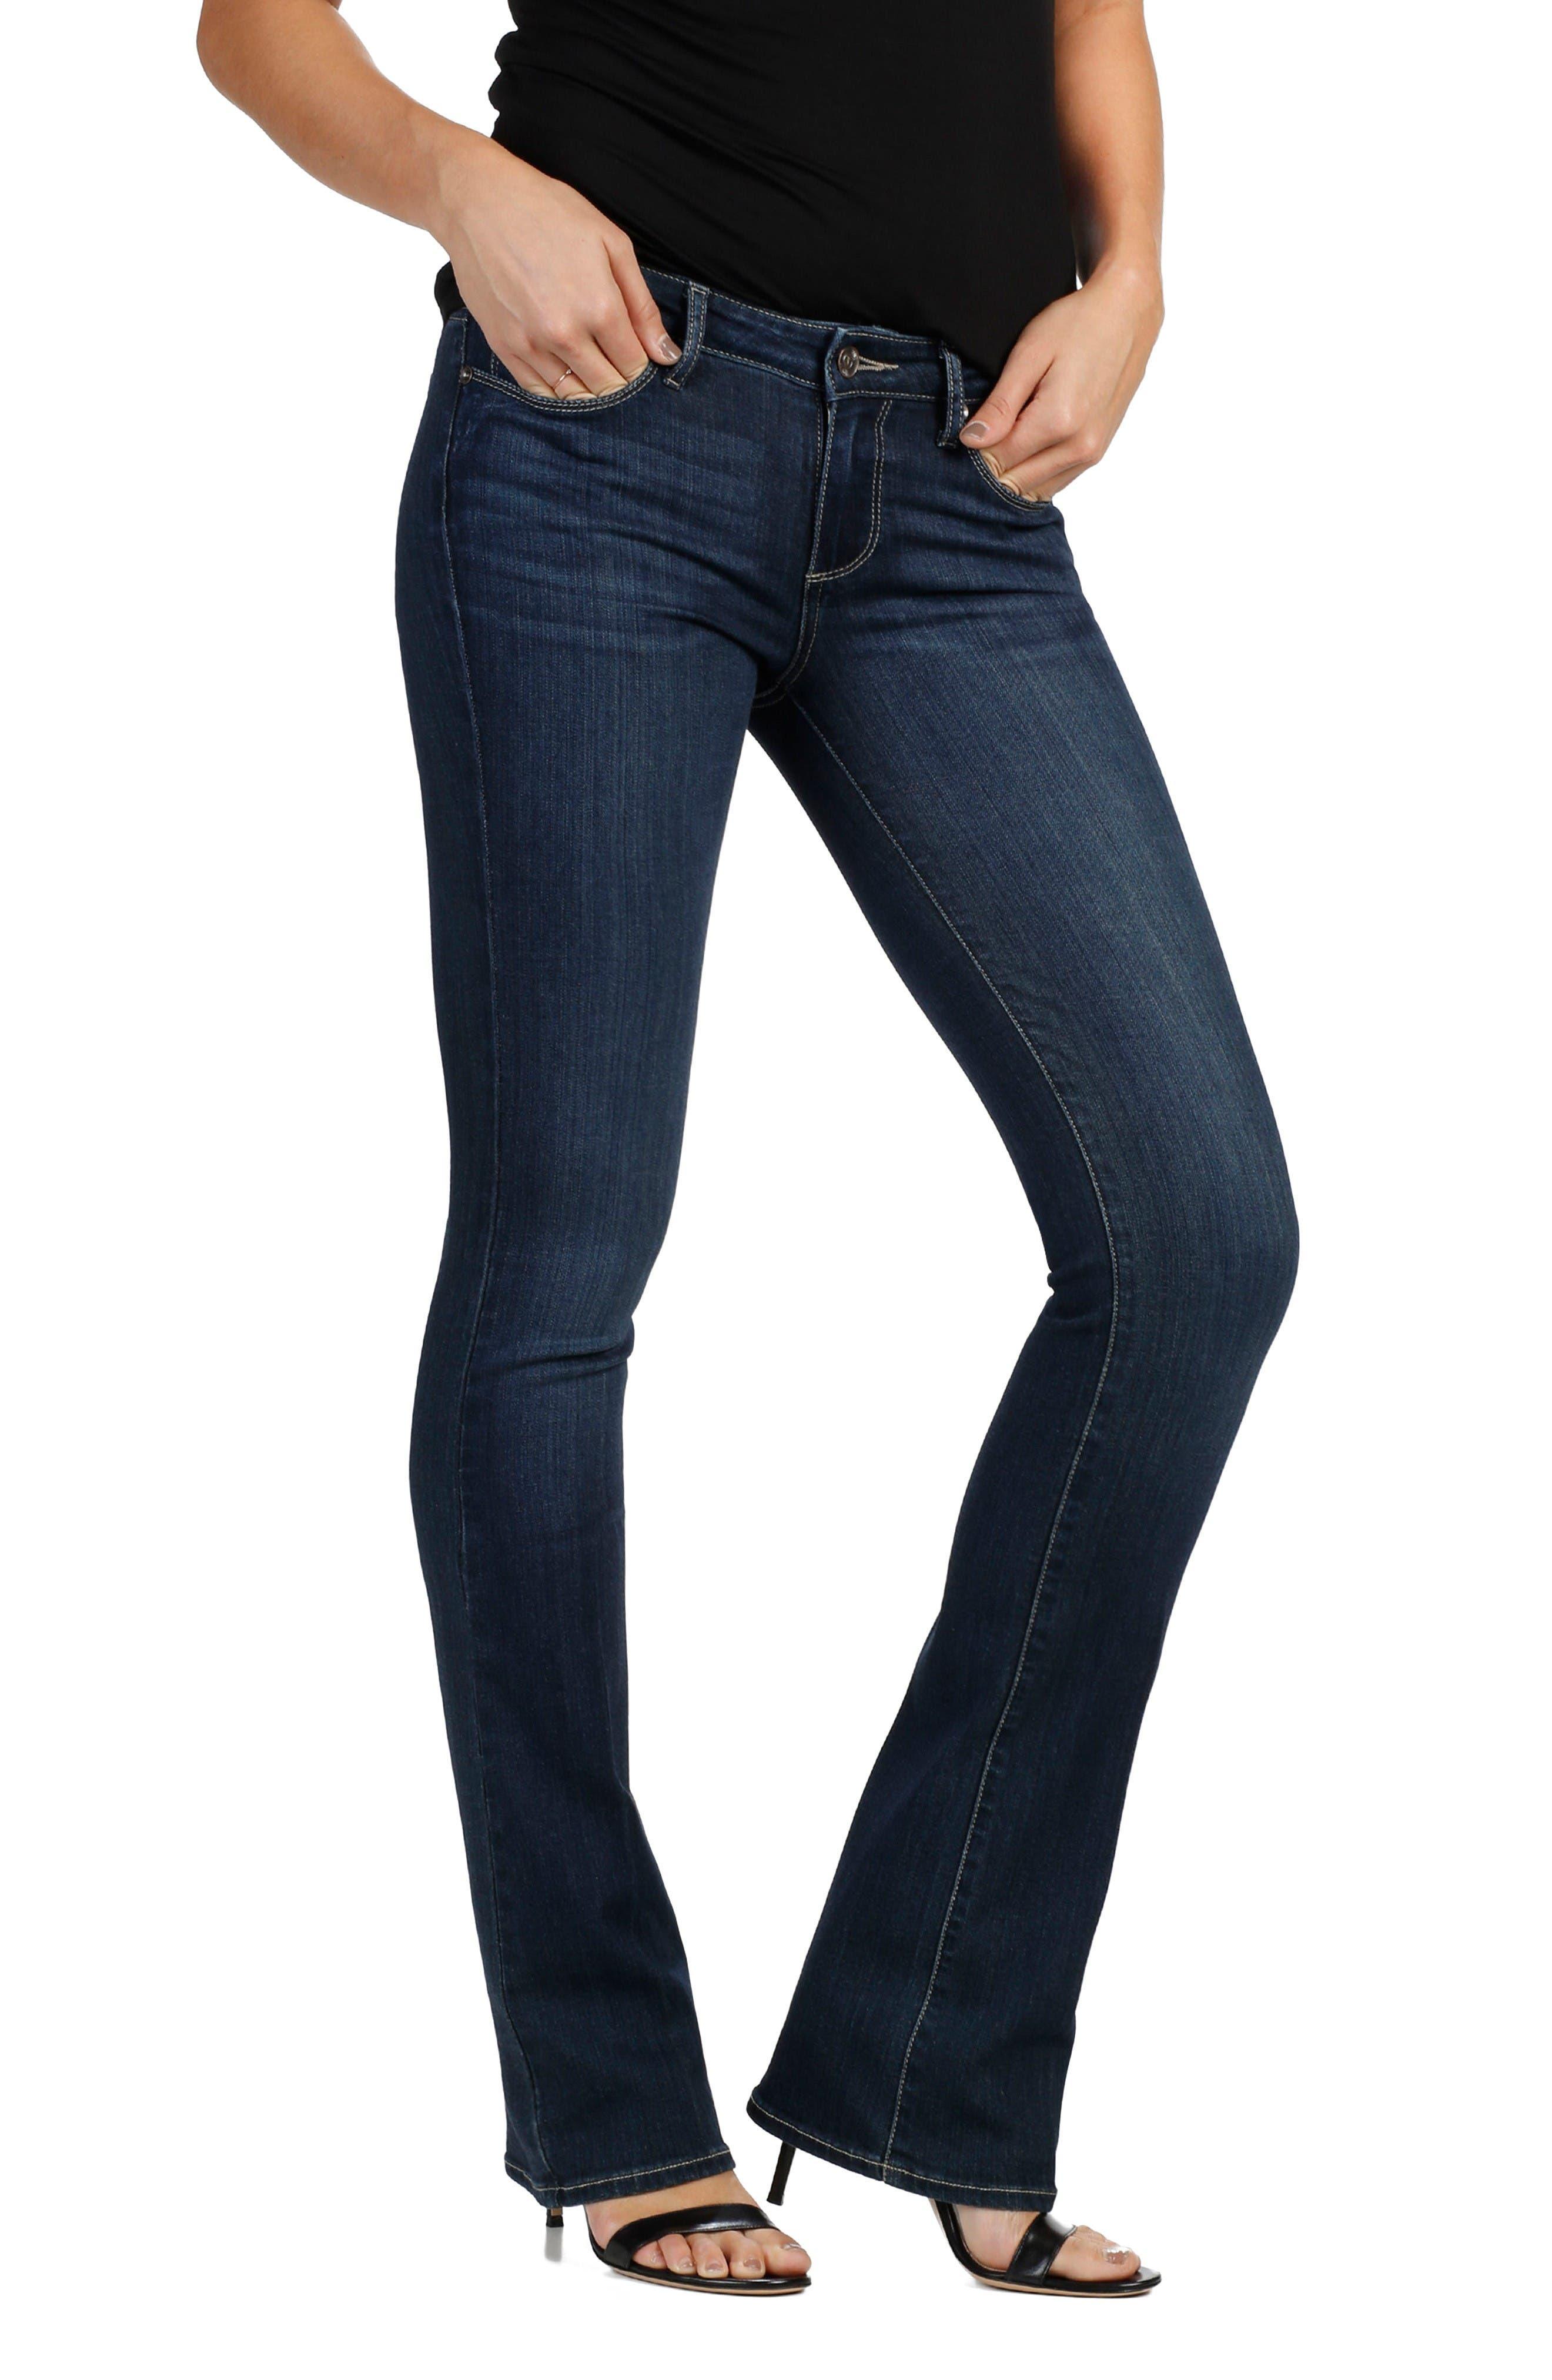 Alternate Image 1 Selected - PAIGE Manhattan Bootcut Jeans (Drift)